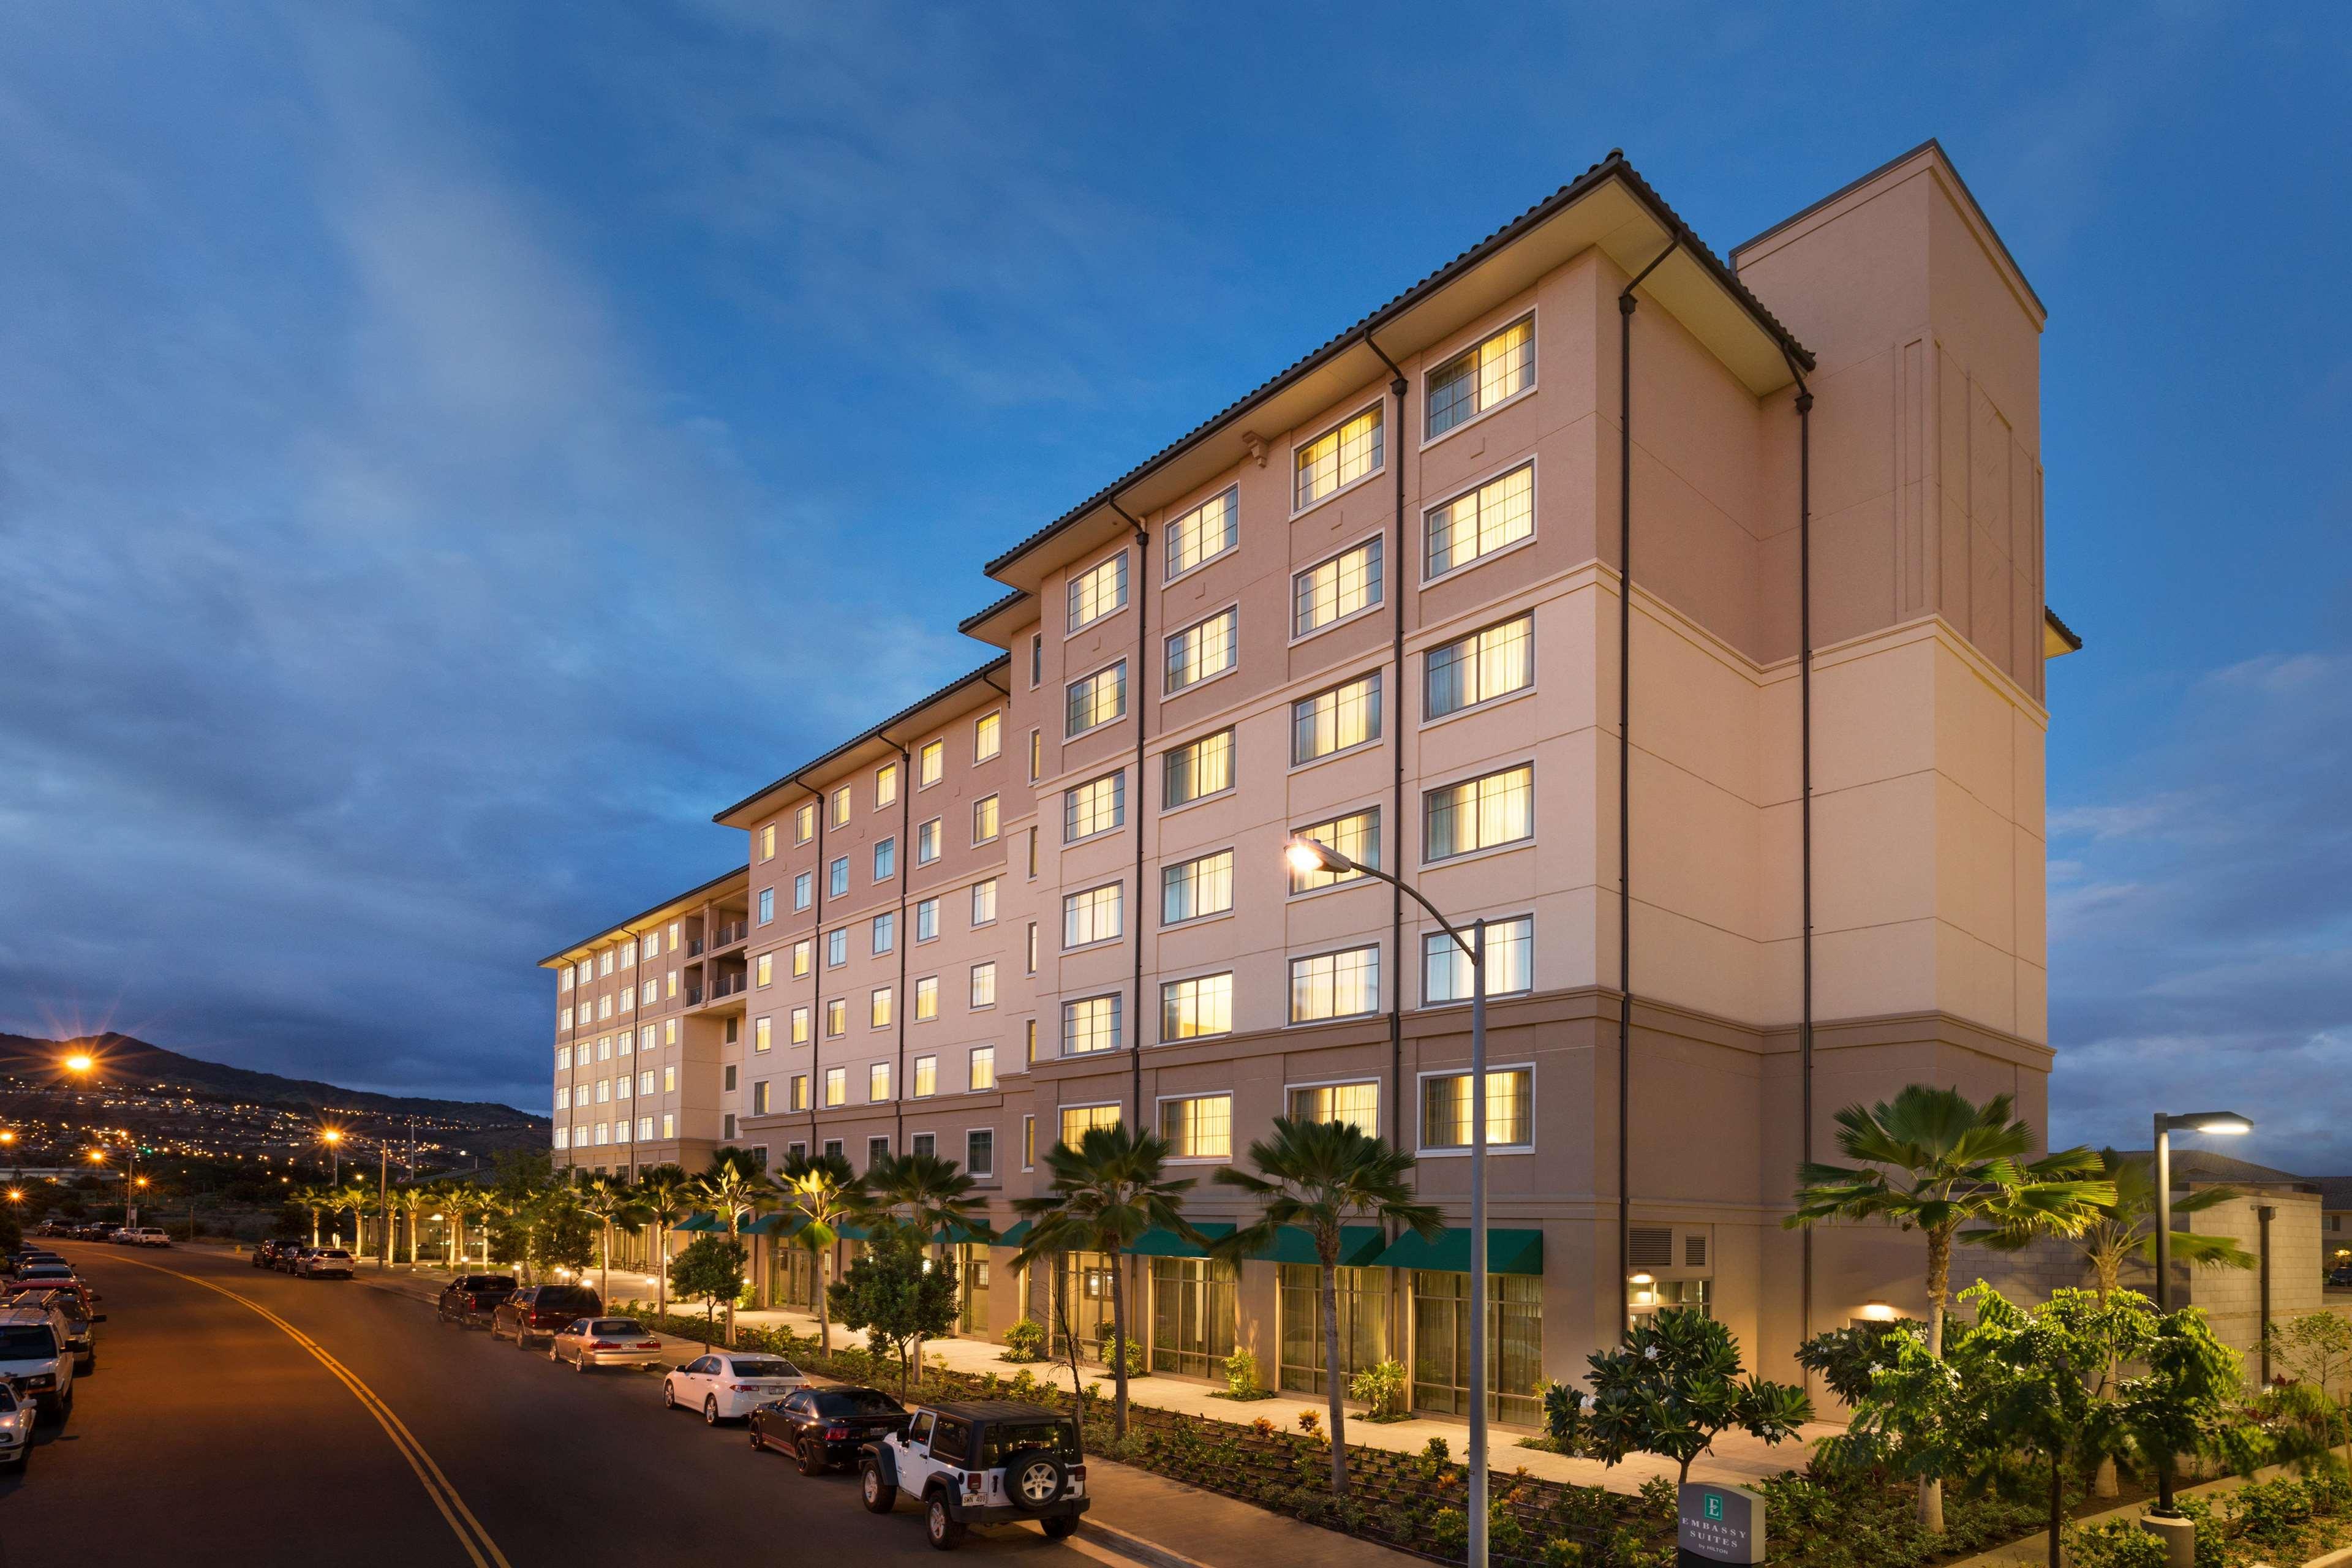 Embassy Suites by Hilton Oahu Kapolei image 2